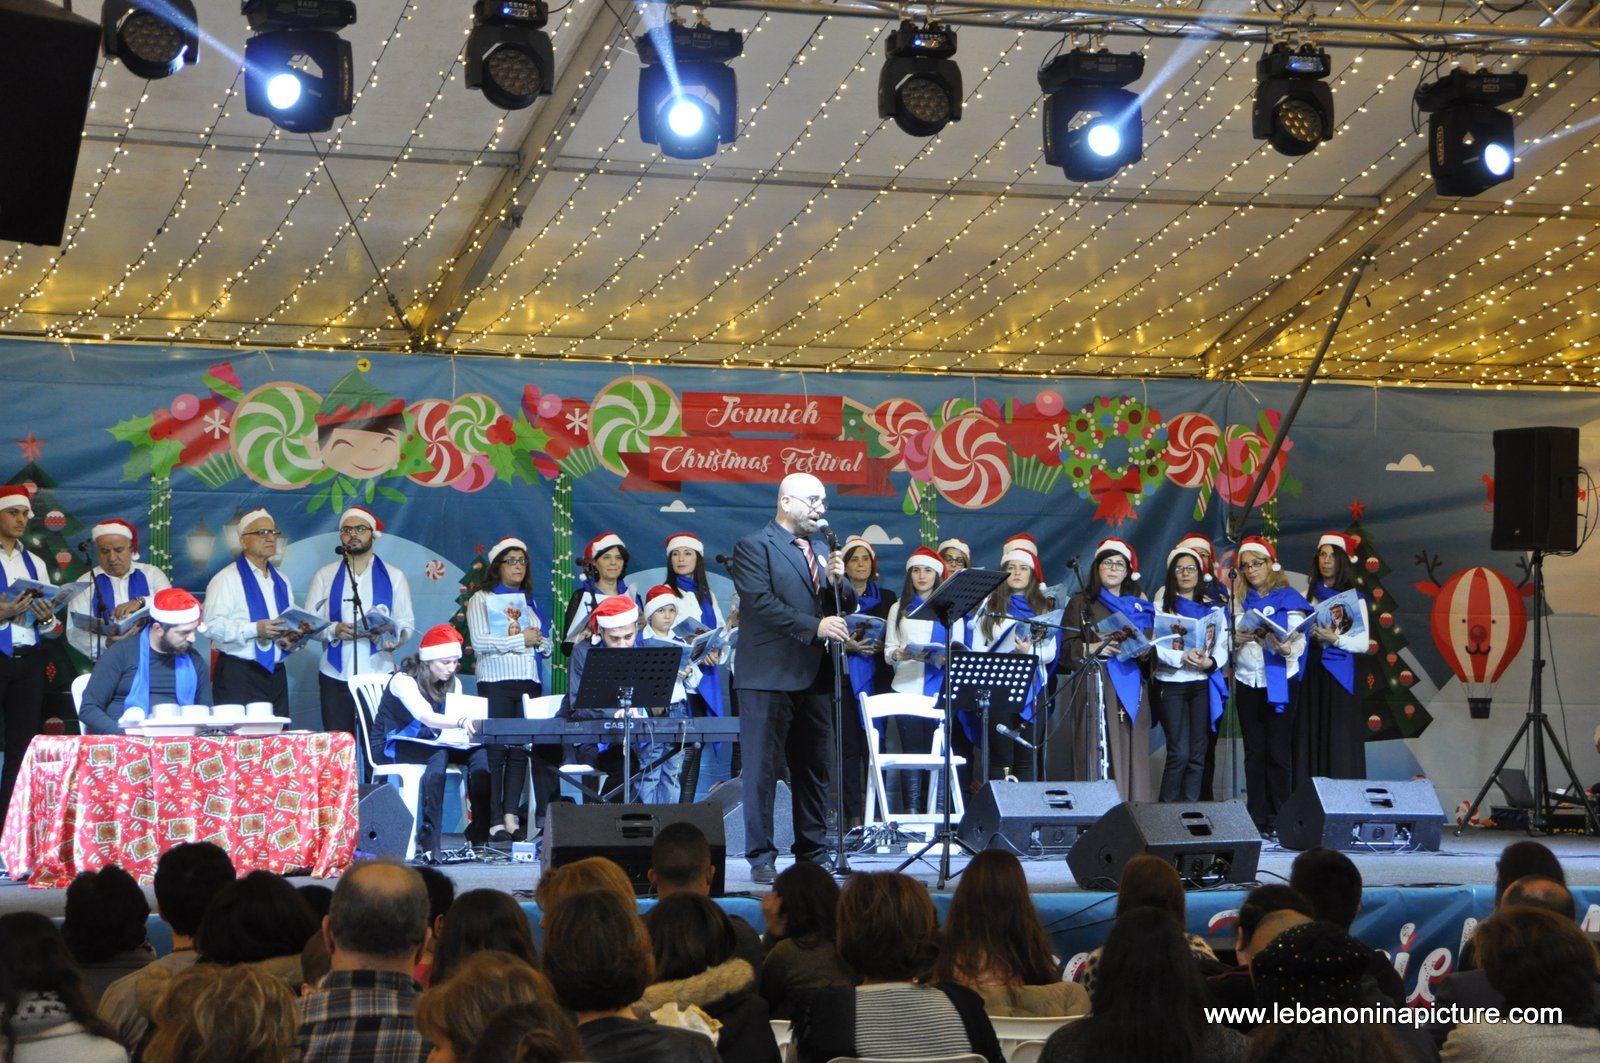 Jounieh Christmas Tree and Christmas Festival 2017 (Jounieh Lebanon)